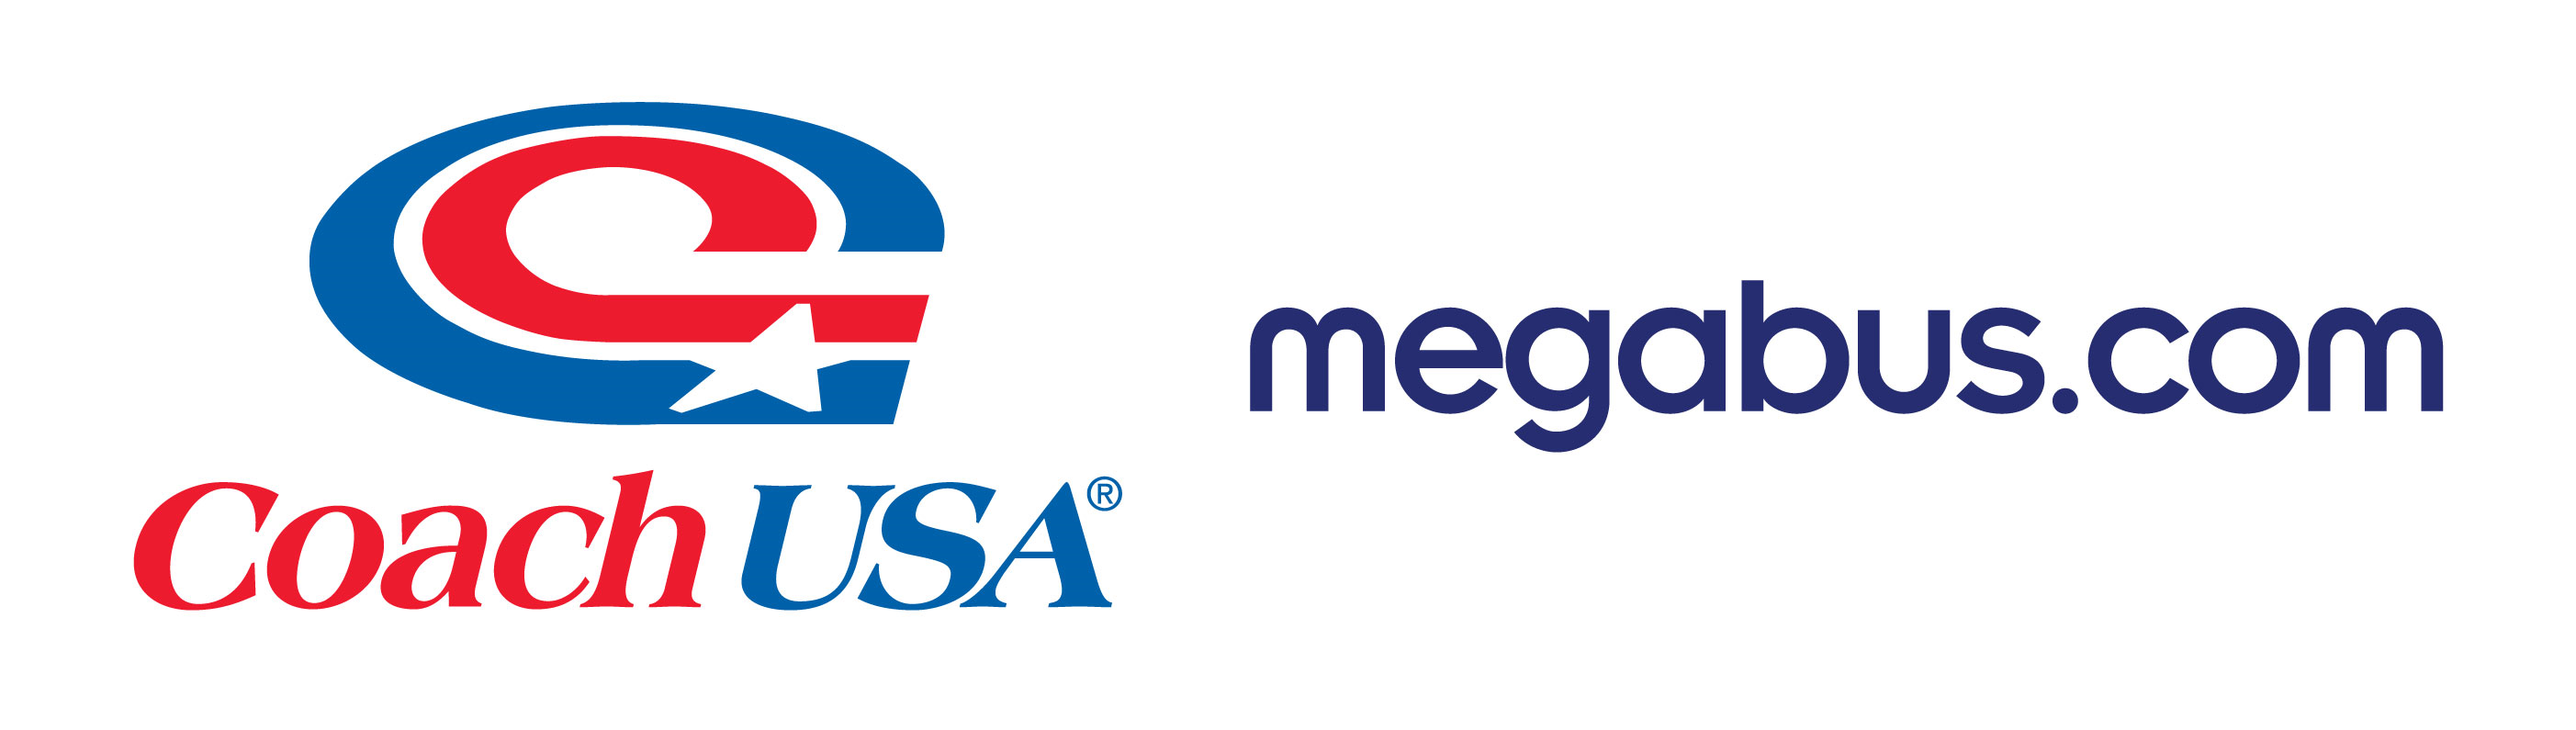 coachusa-megabus-logo-6